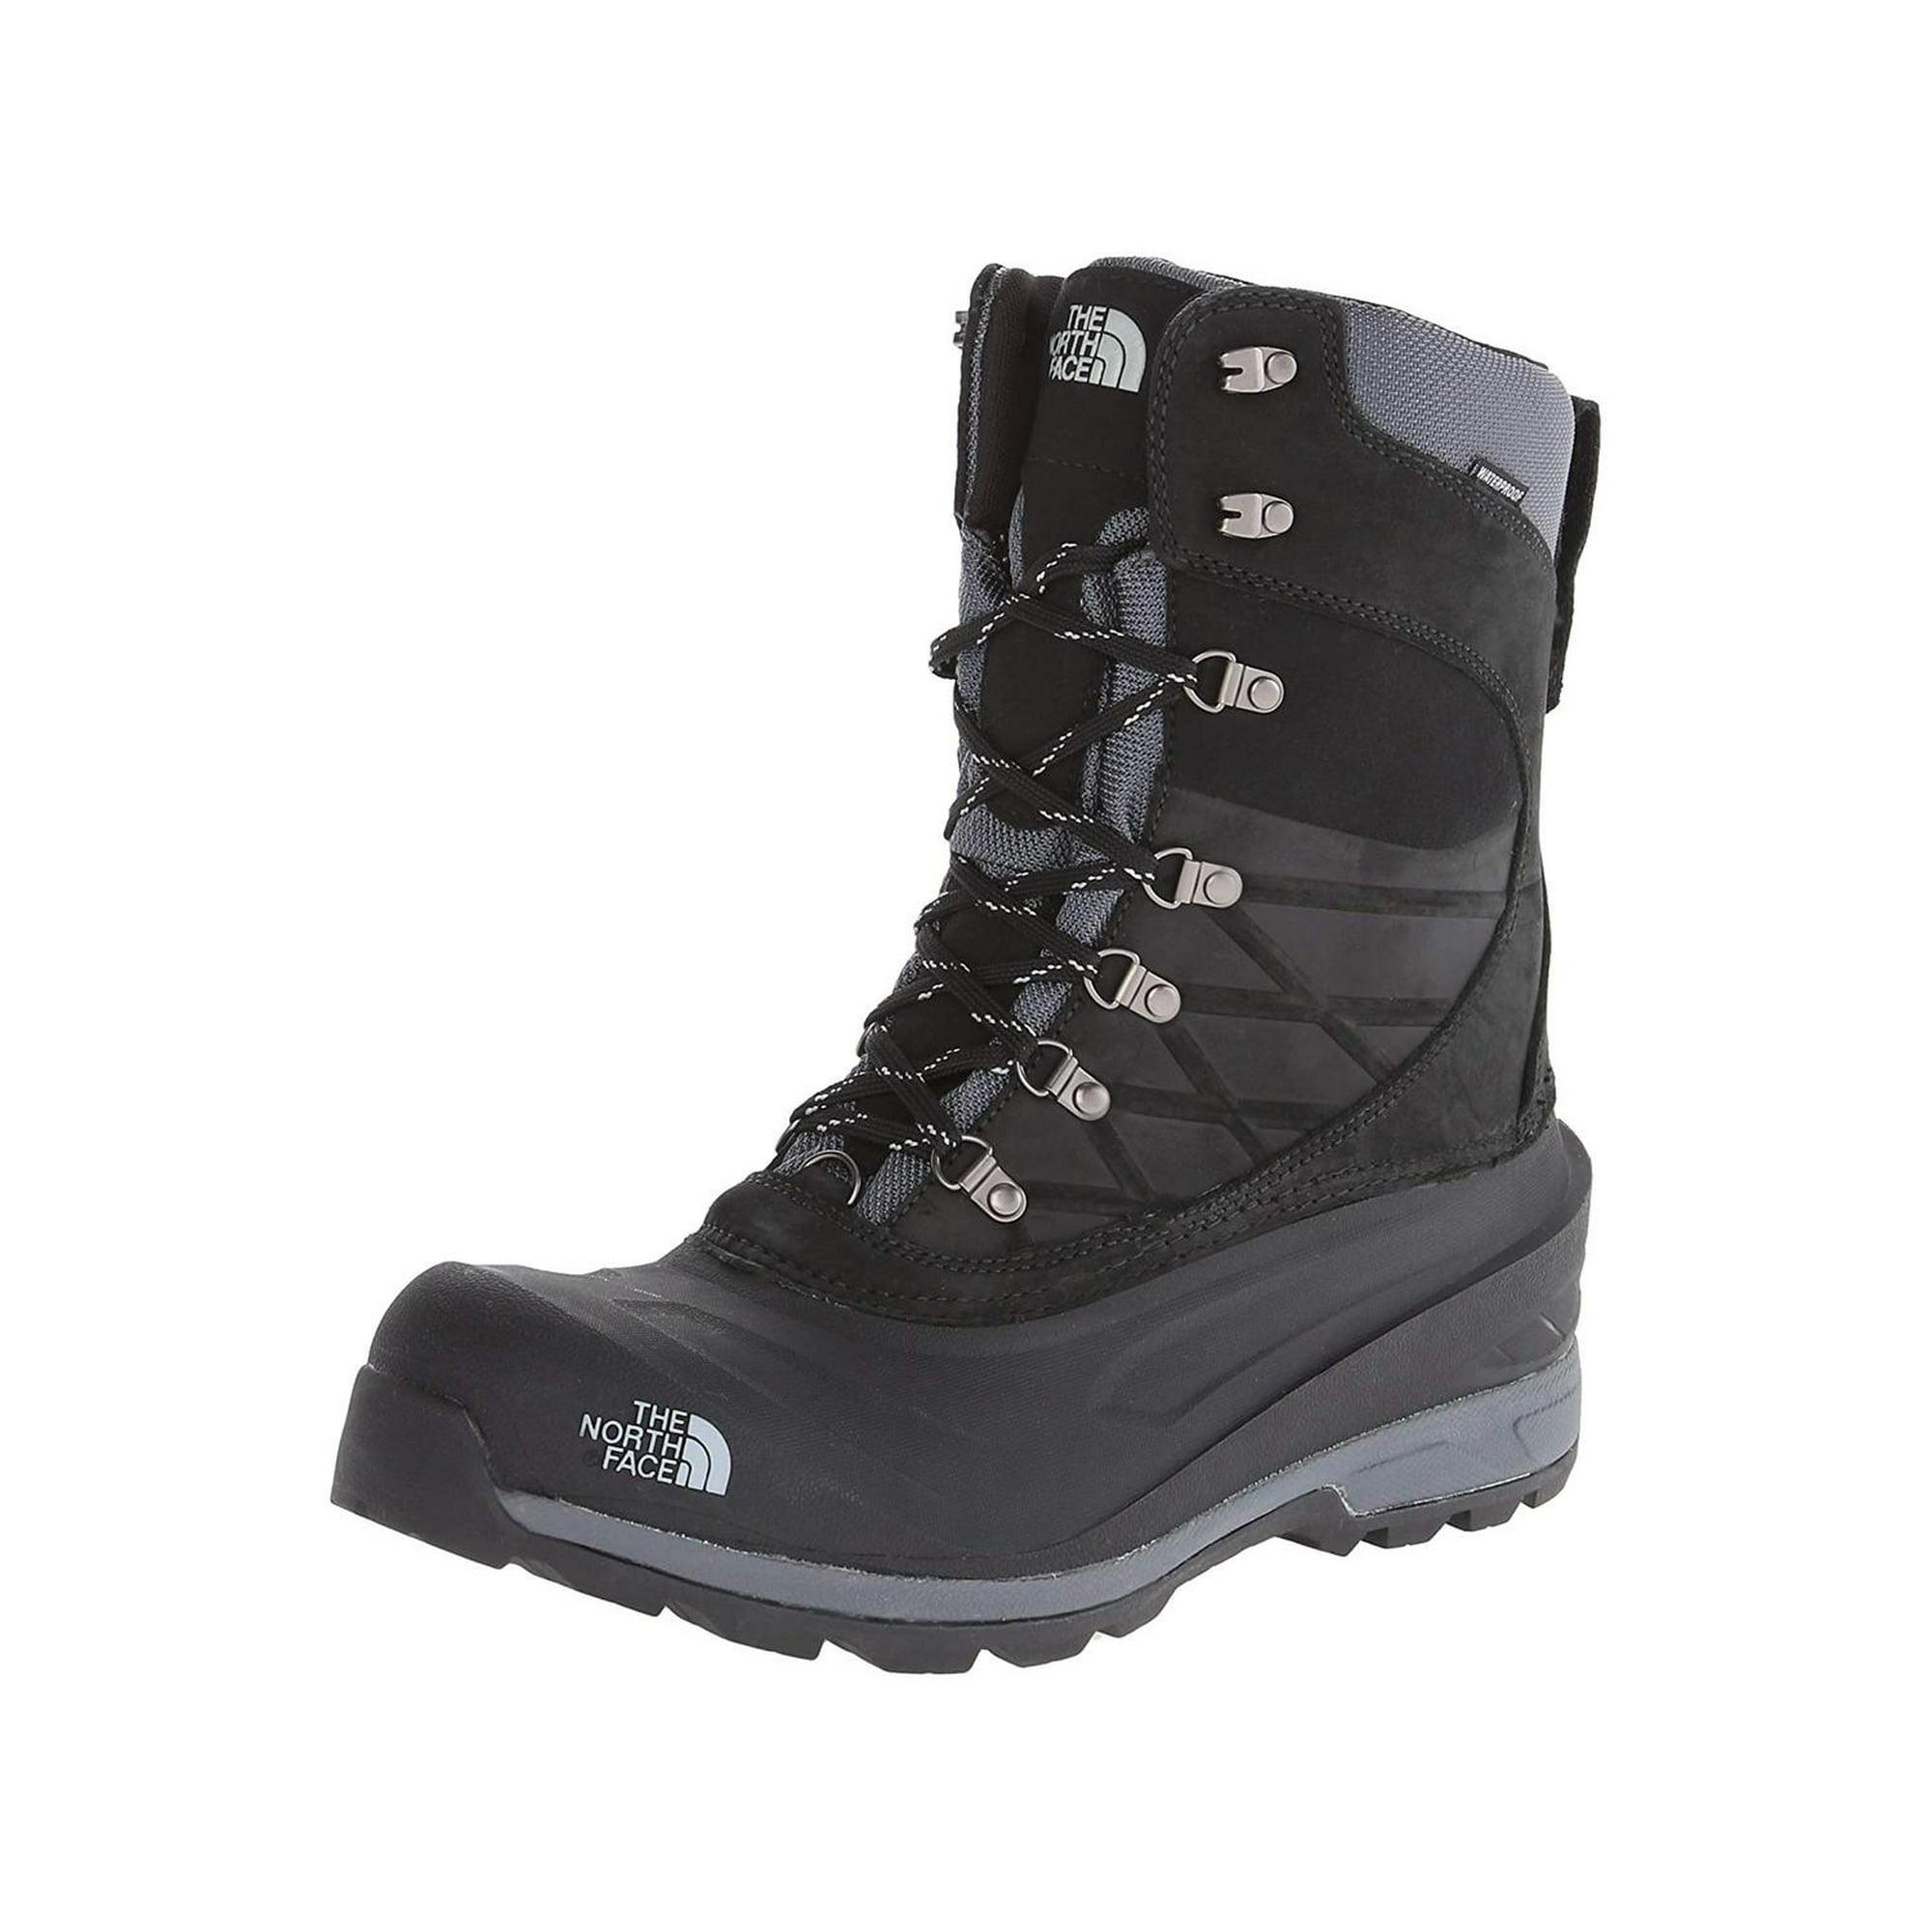 e42a1c077 The North Face Verbera Utility Boot - Men's